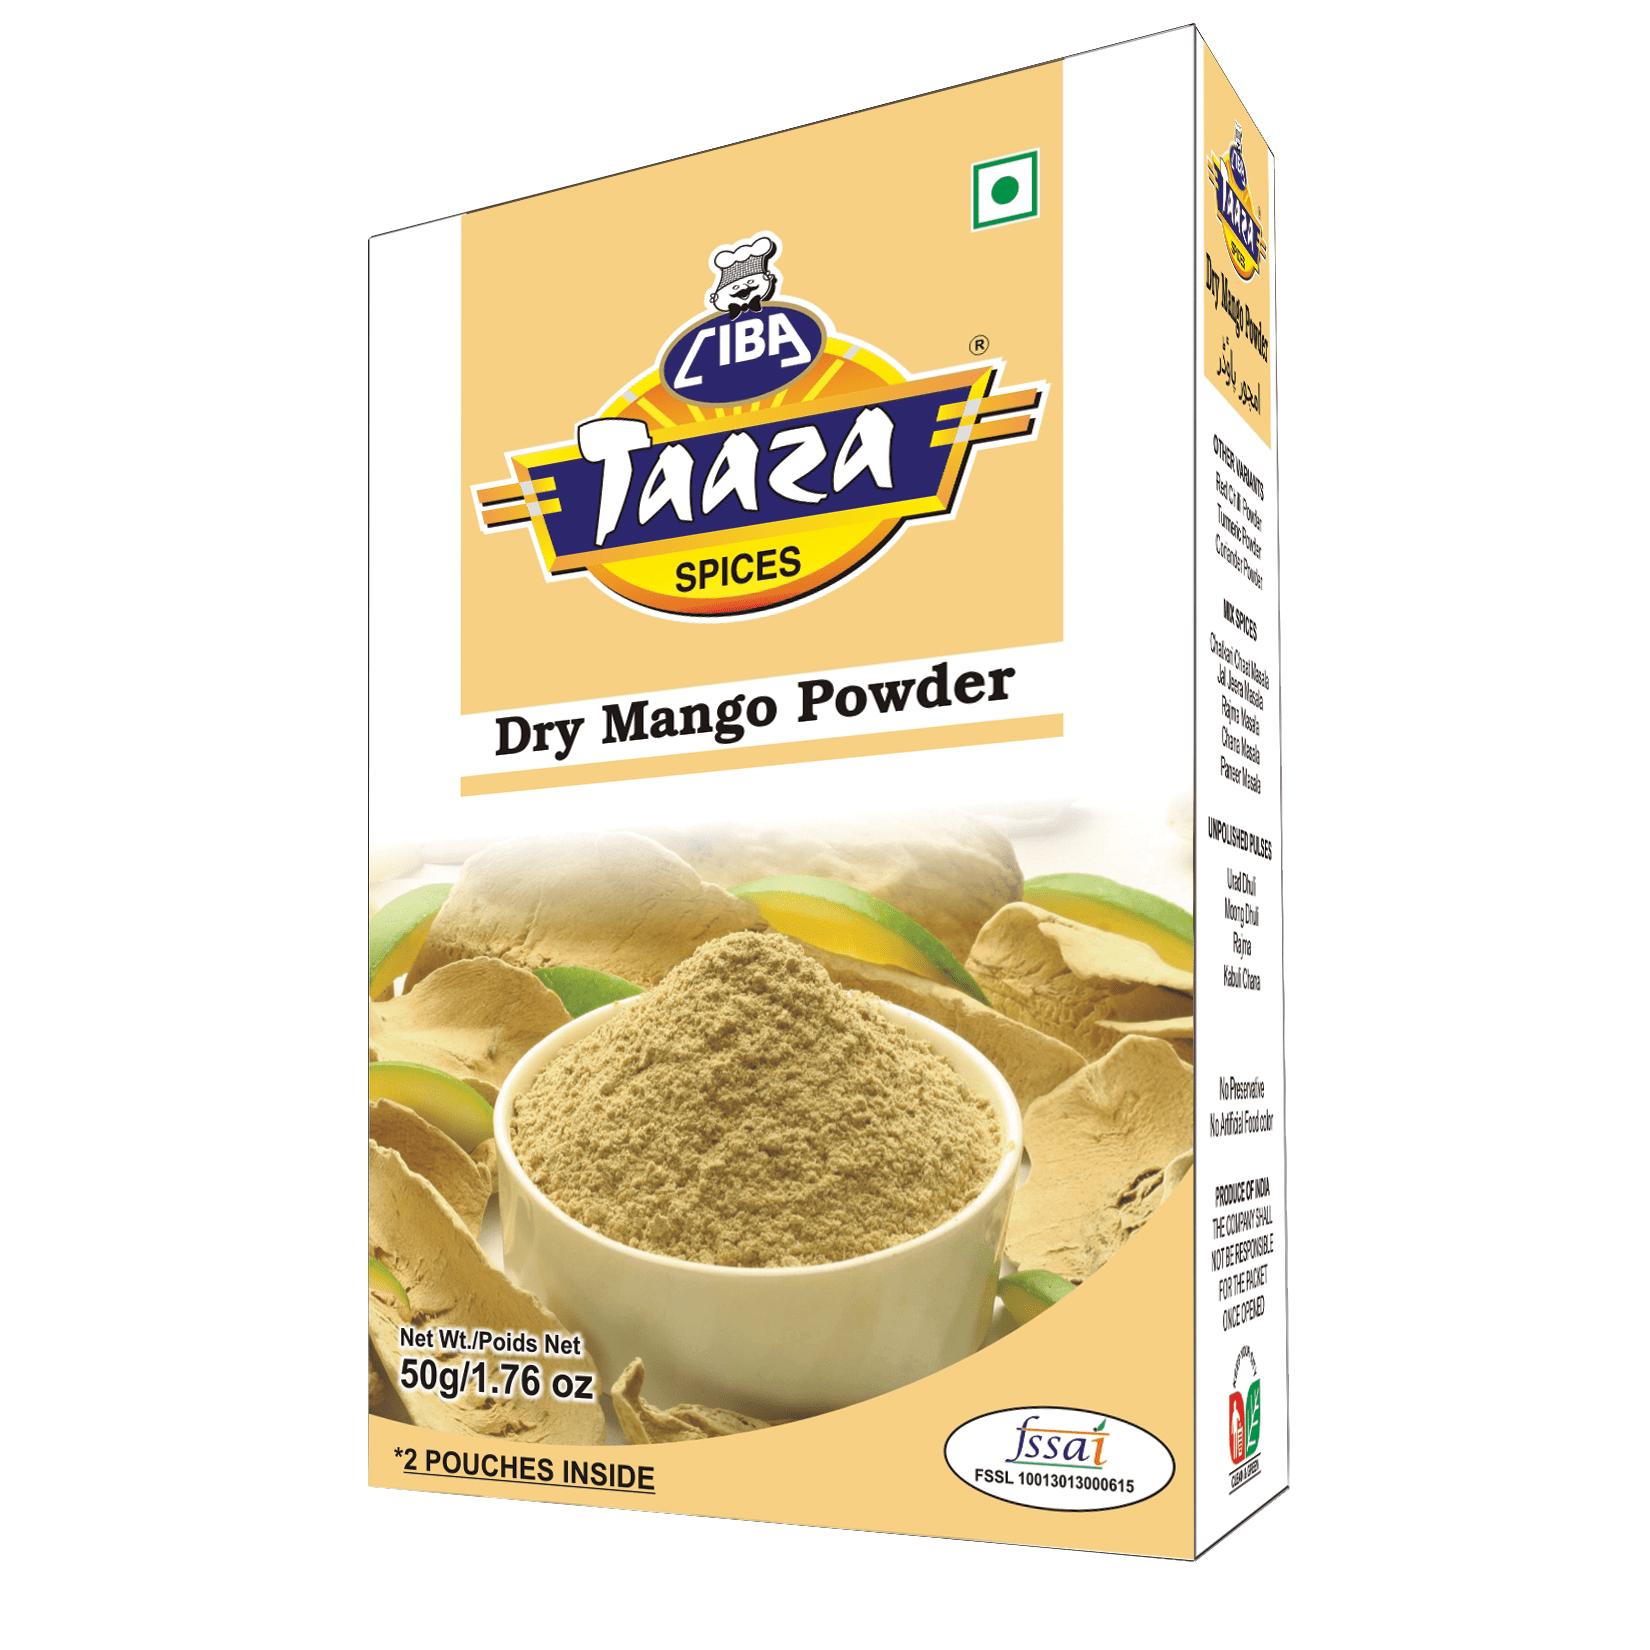 Amchur Powder (Dry Mango Powder), 50g - Ciba Taaza Spices